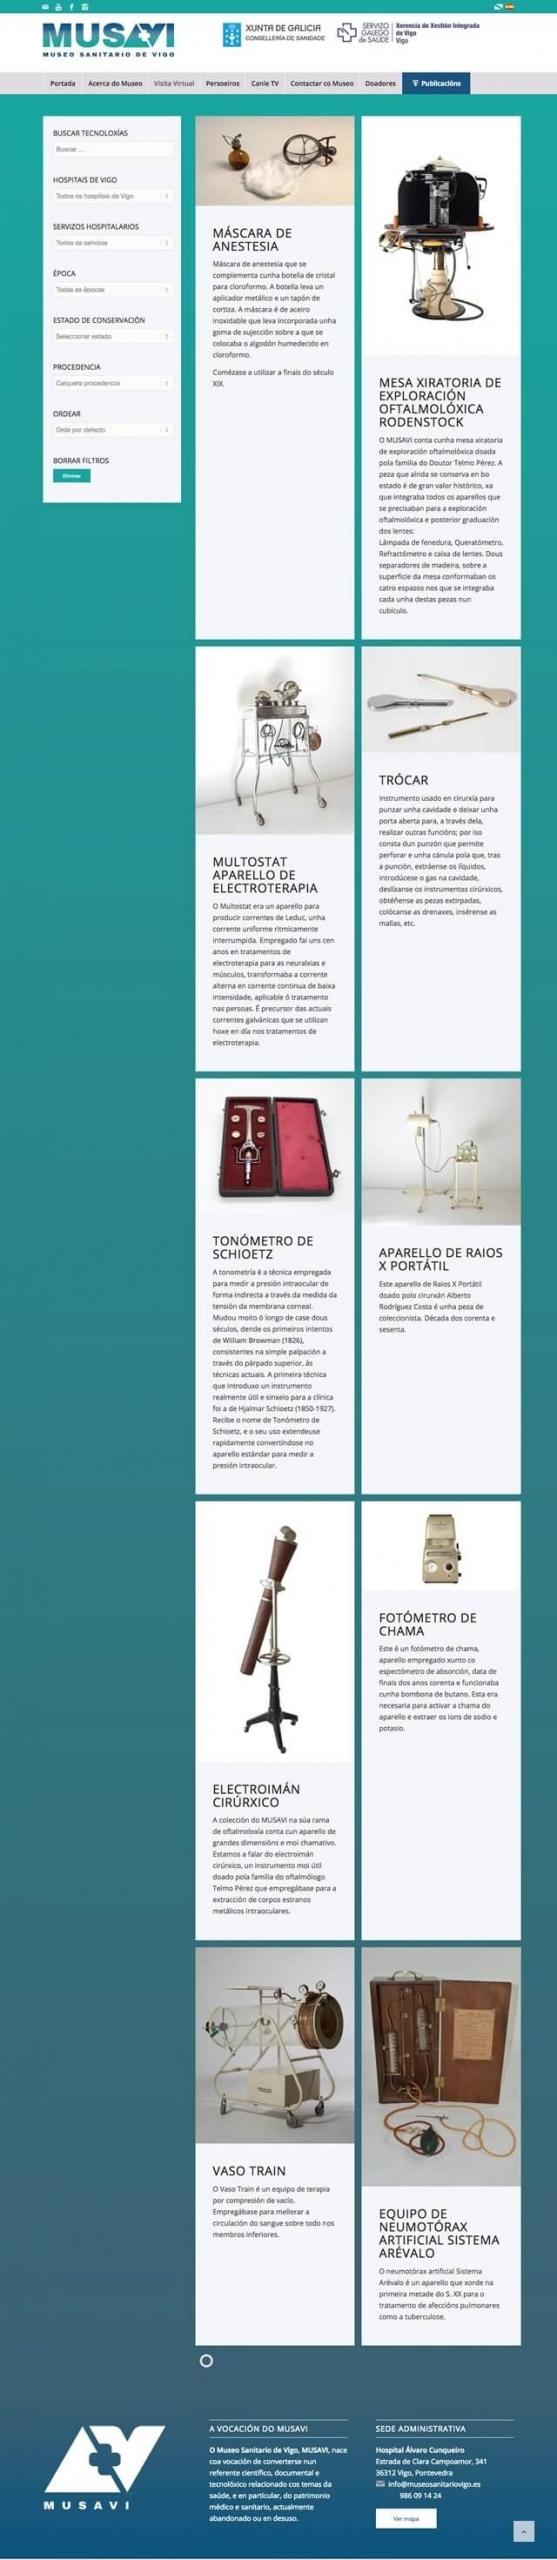 Vista de la pagina inicial de musavi